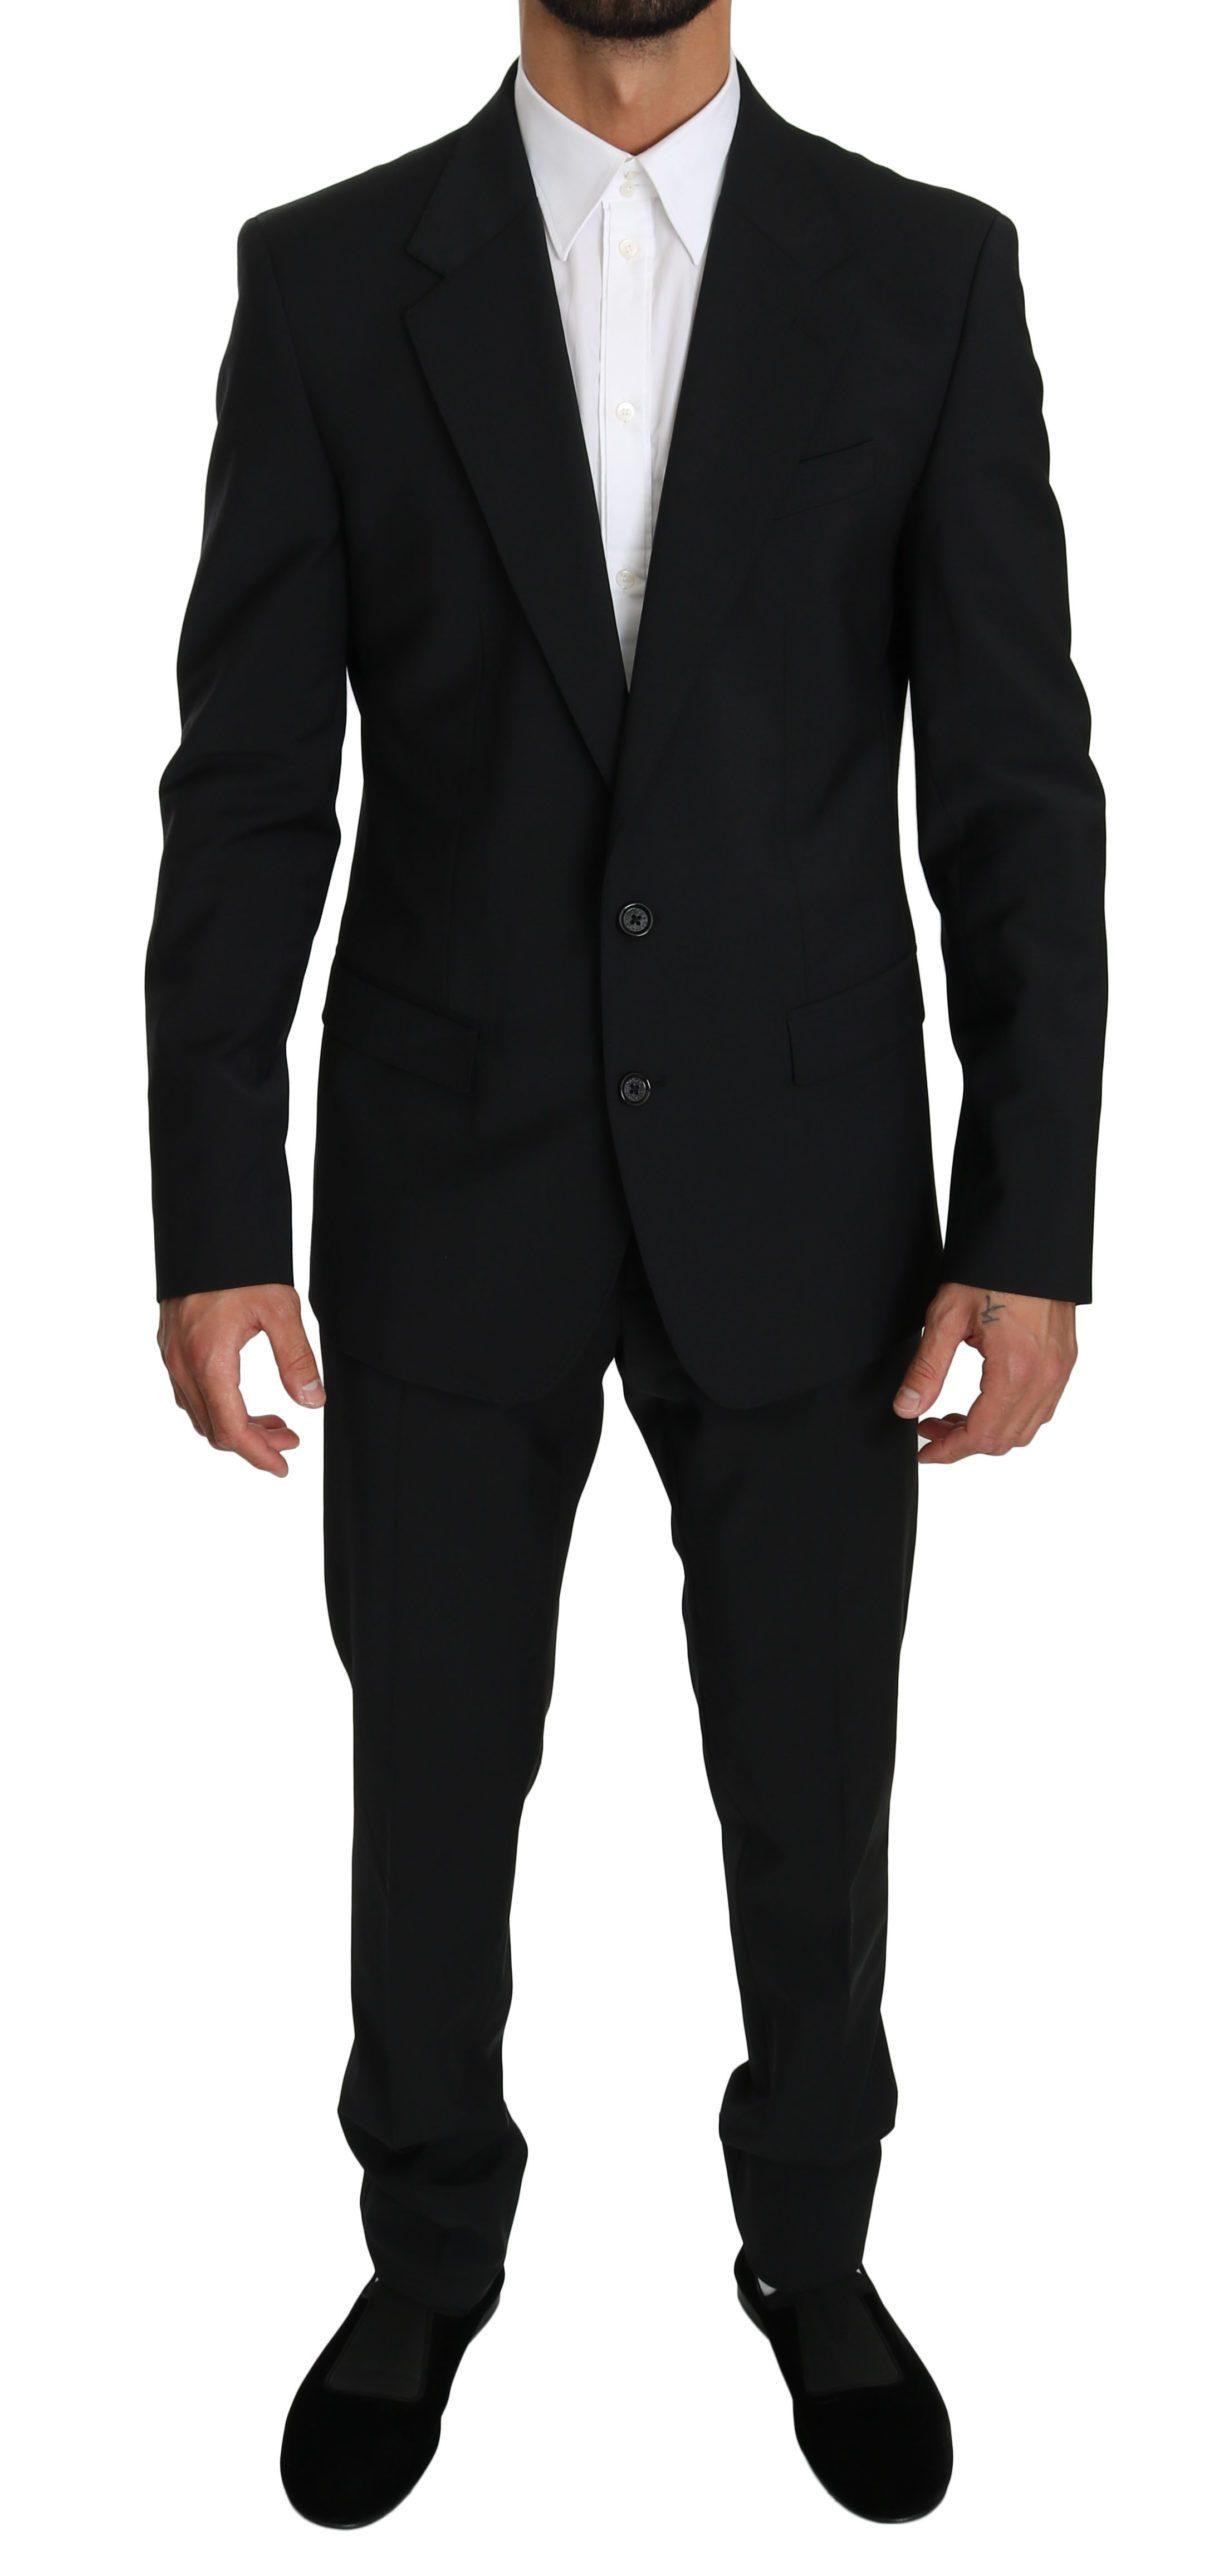 Dolce & Gabbana Men's Single Breasted 2 Piece MARTINI Suit Black KOS1613 - IT50   L